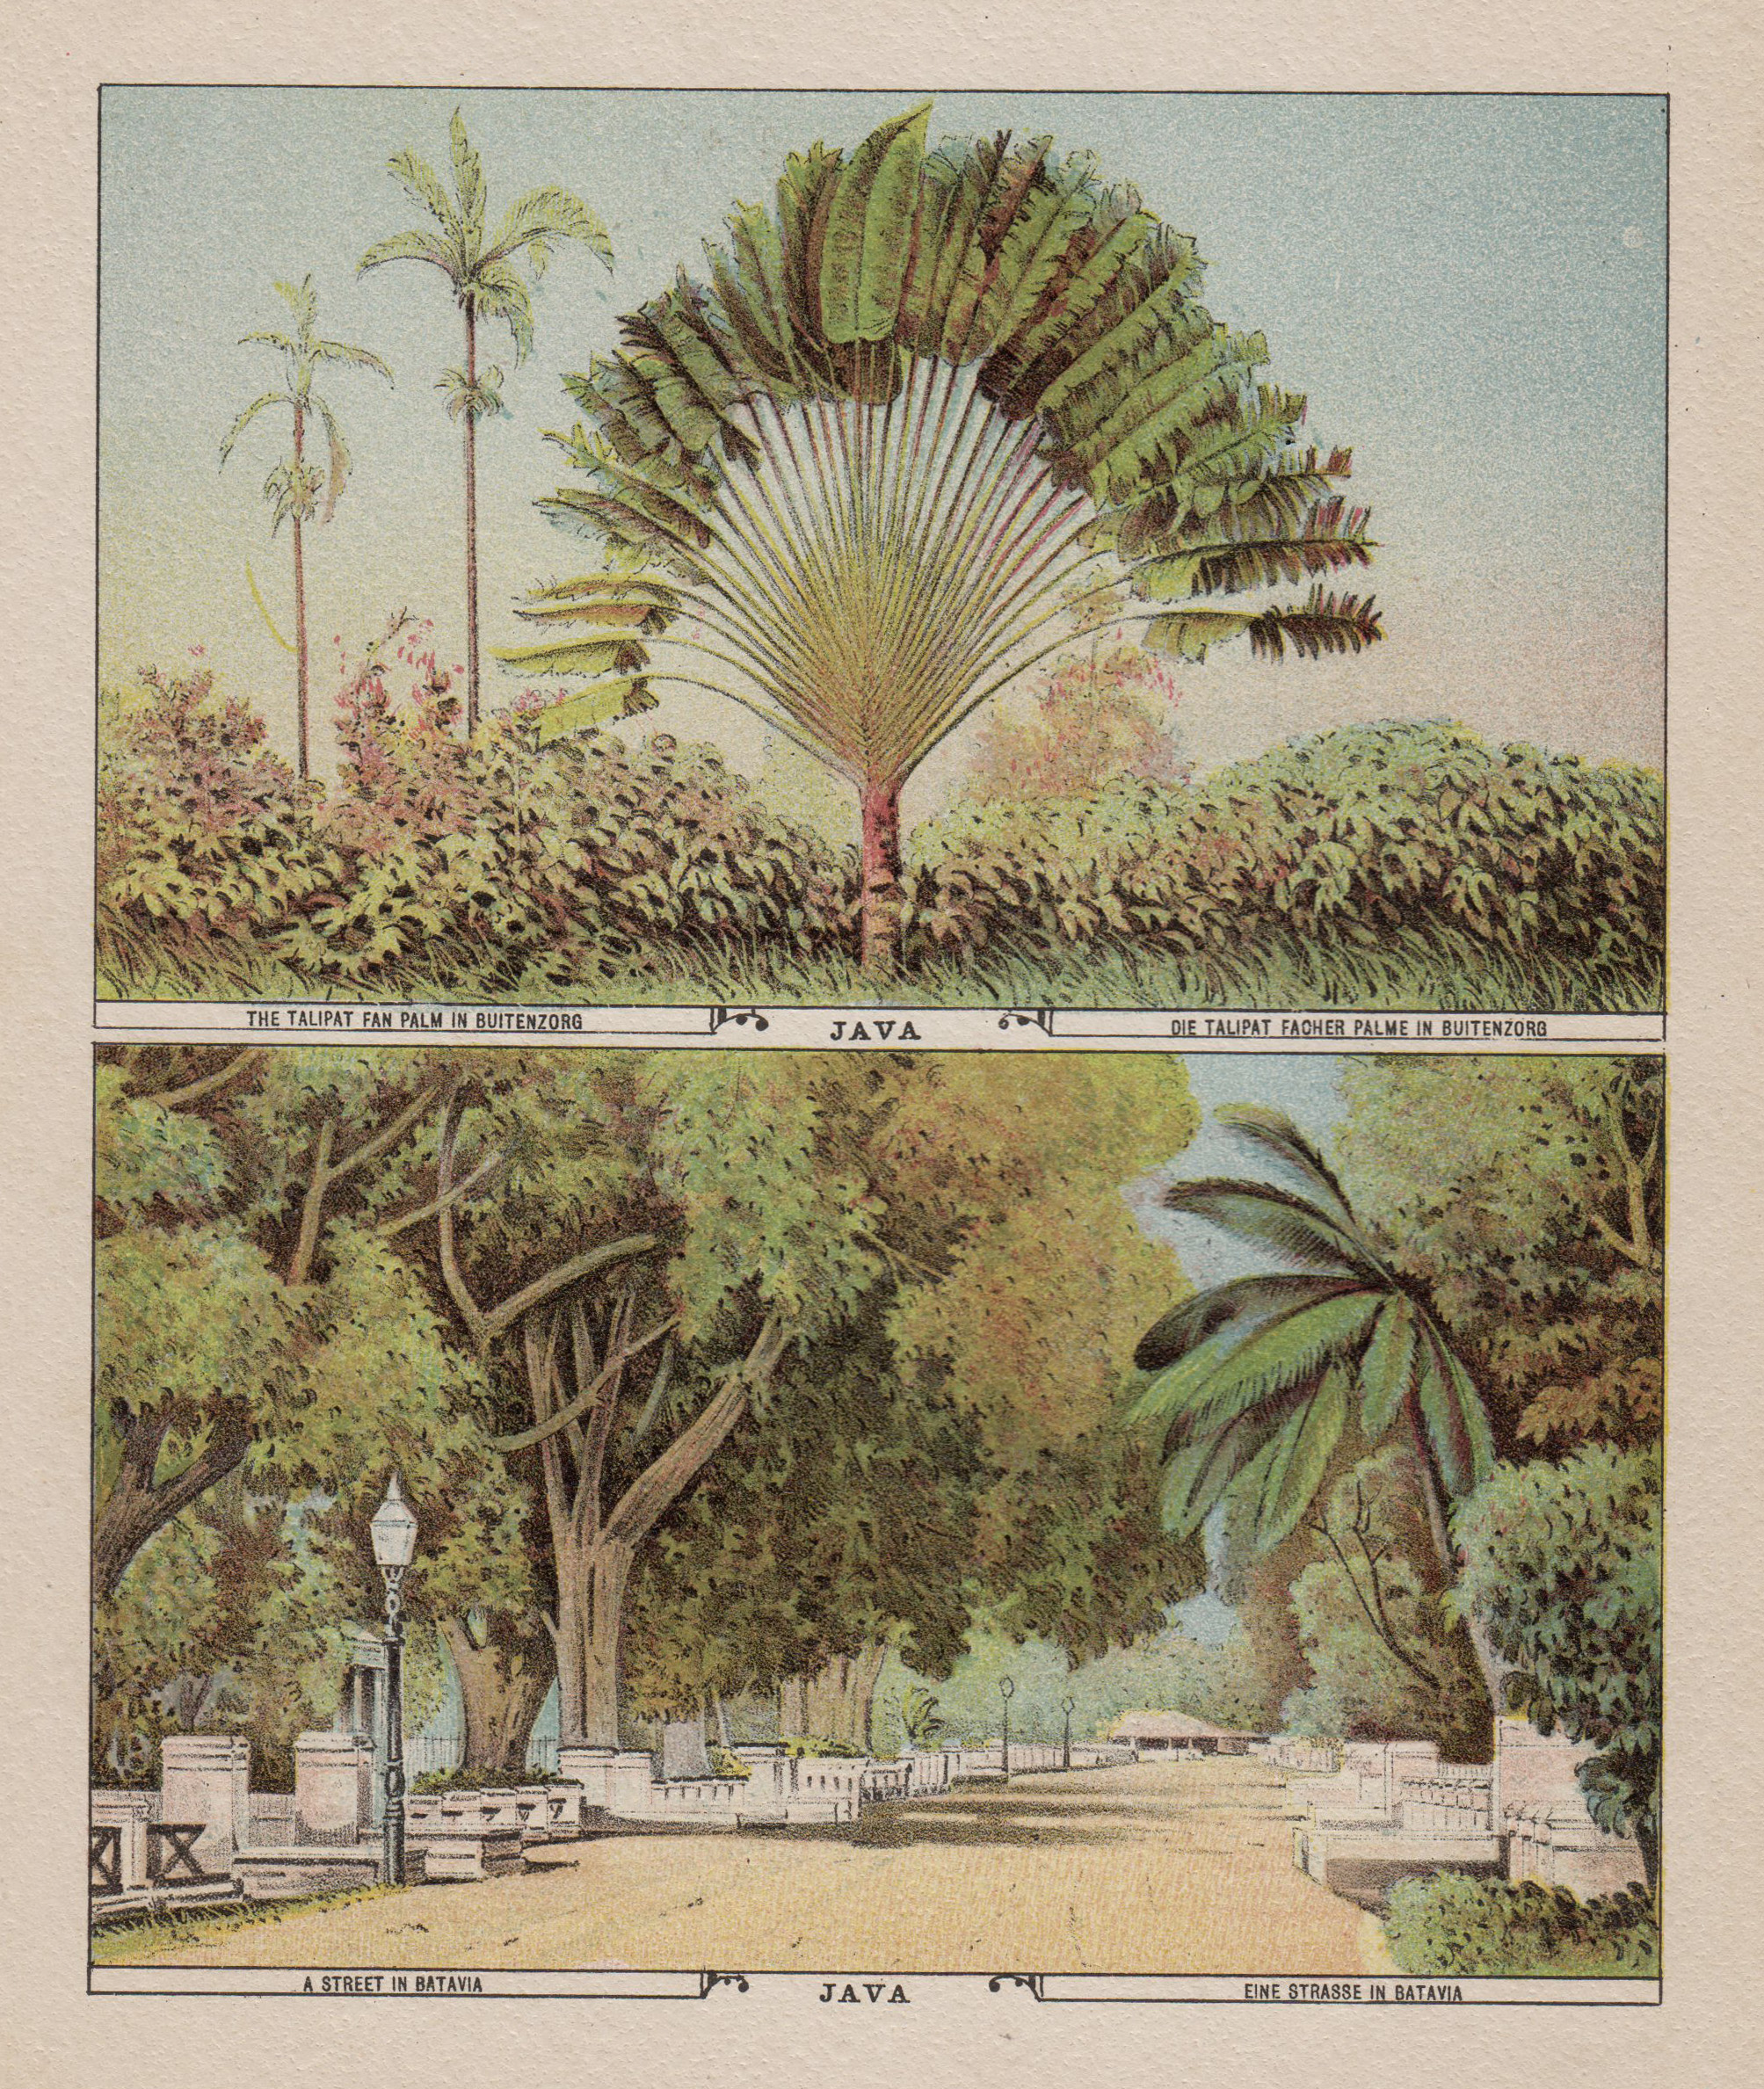 Die Talipat Fächer Palme in Buitenzorb -: Indonesien ( Indonesia